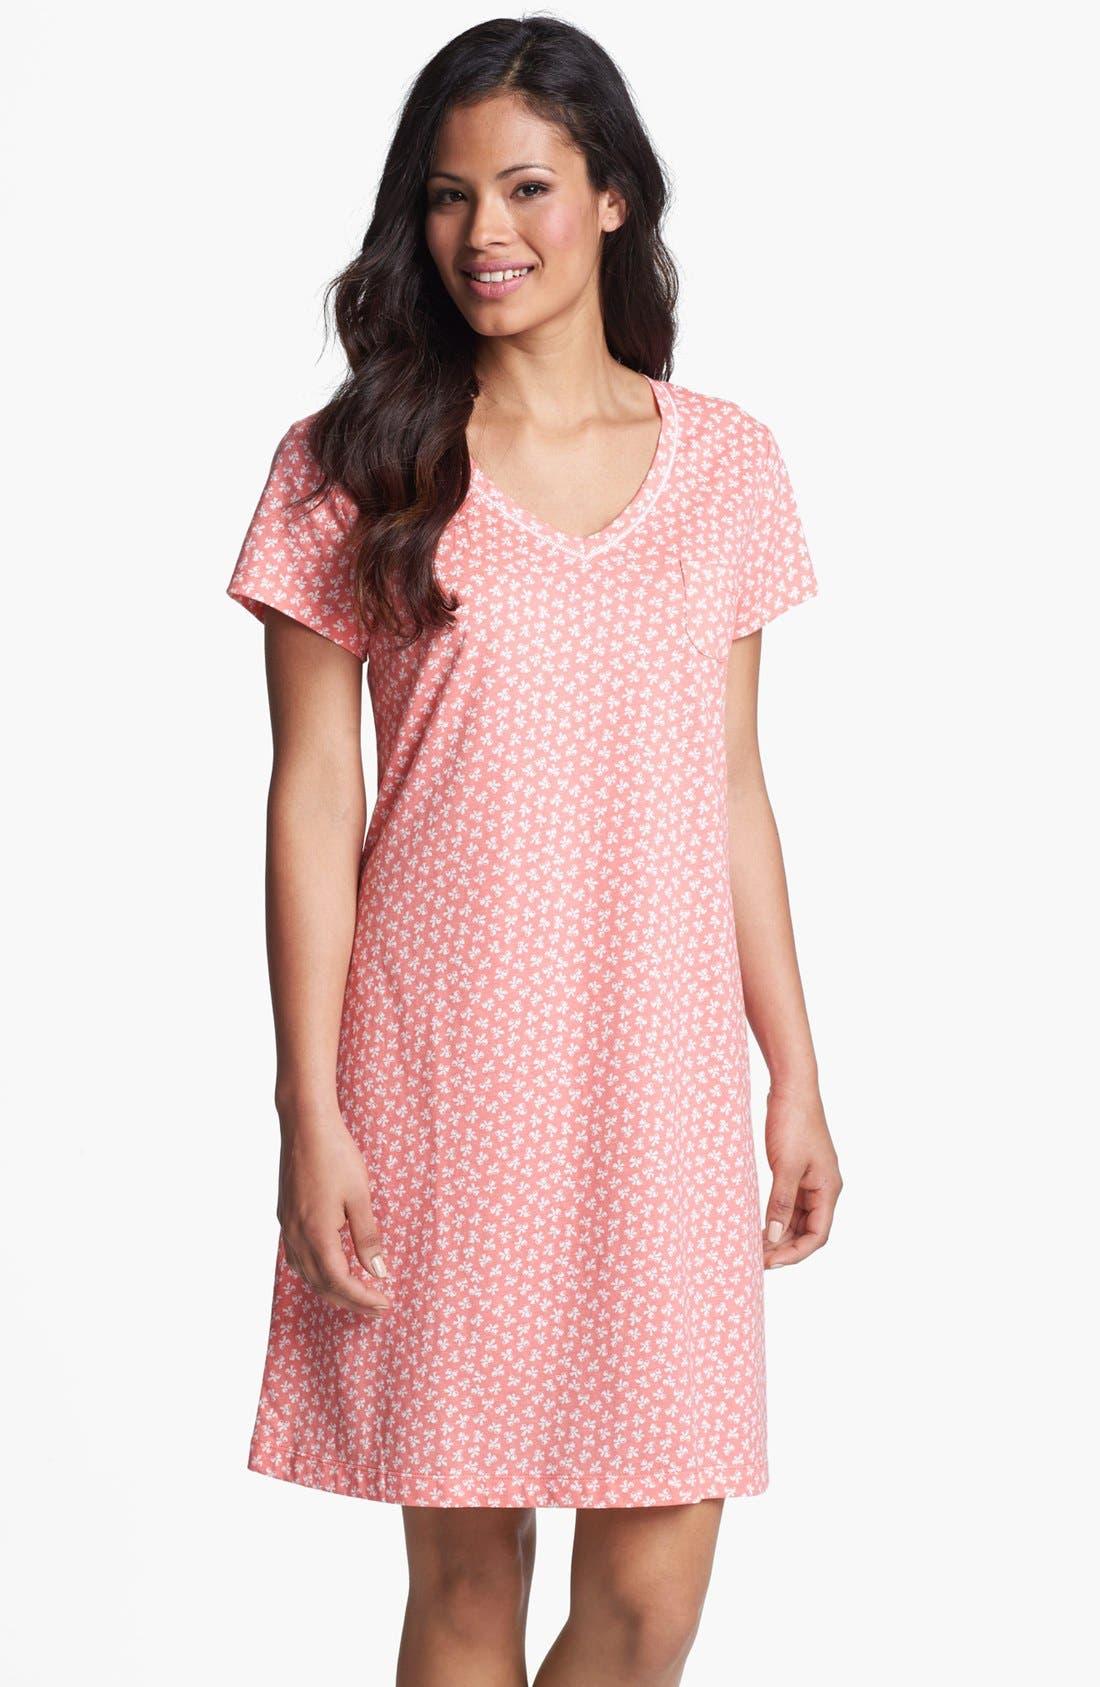 Alternate Image 1 Selected - Carole Hochman Cotton Knit Sleep Shirt